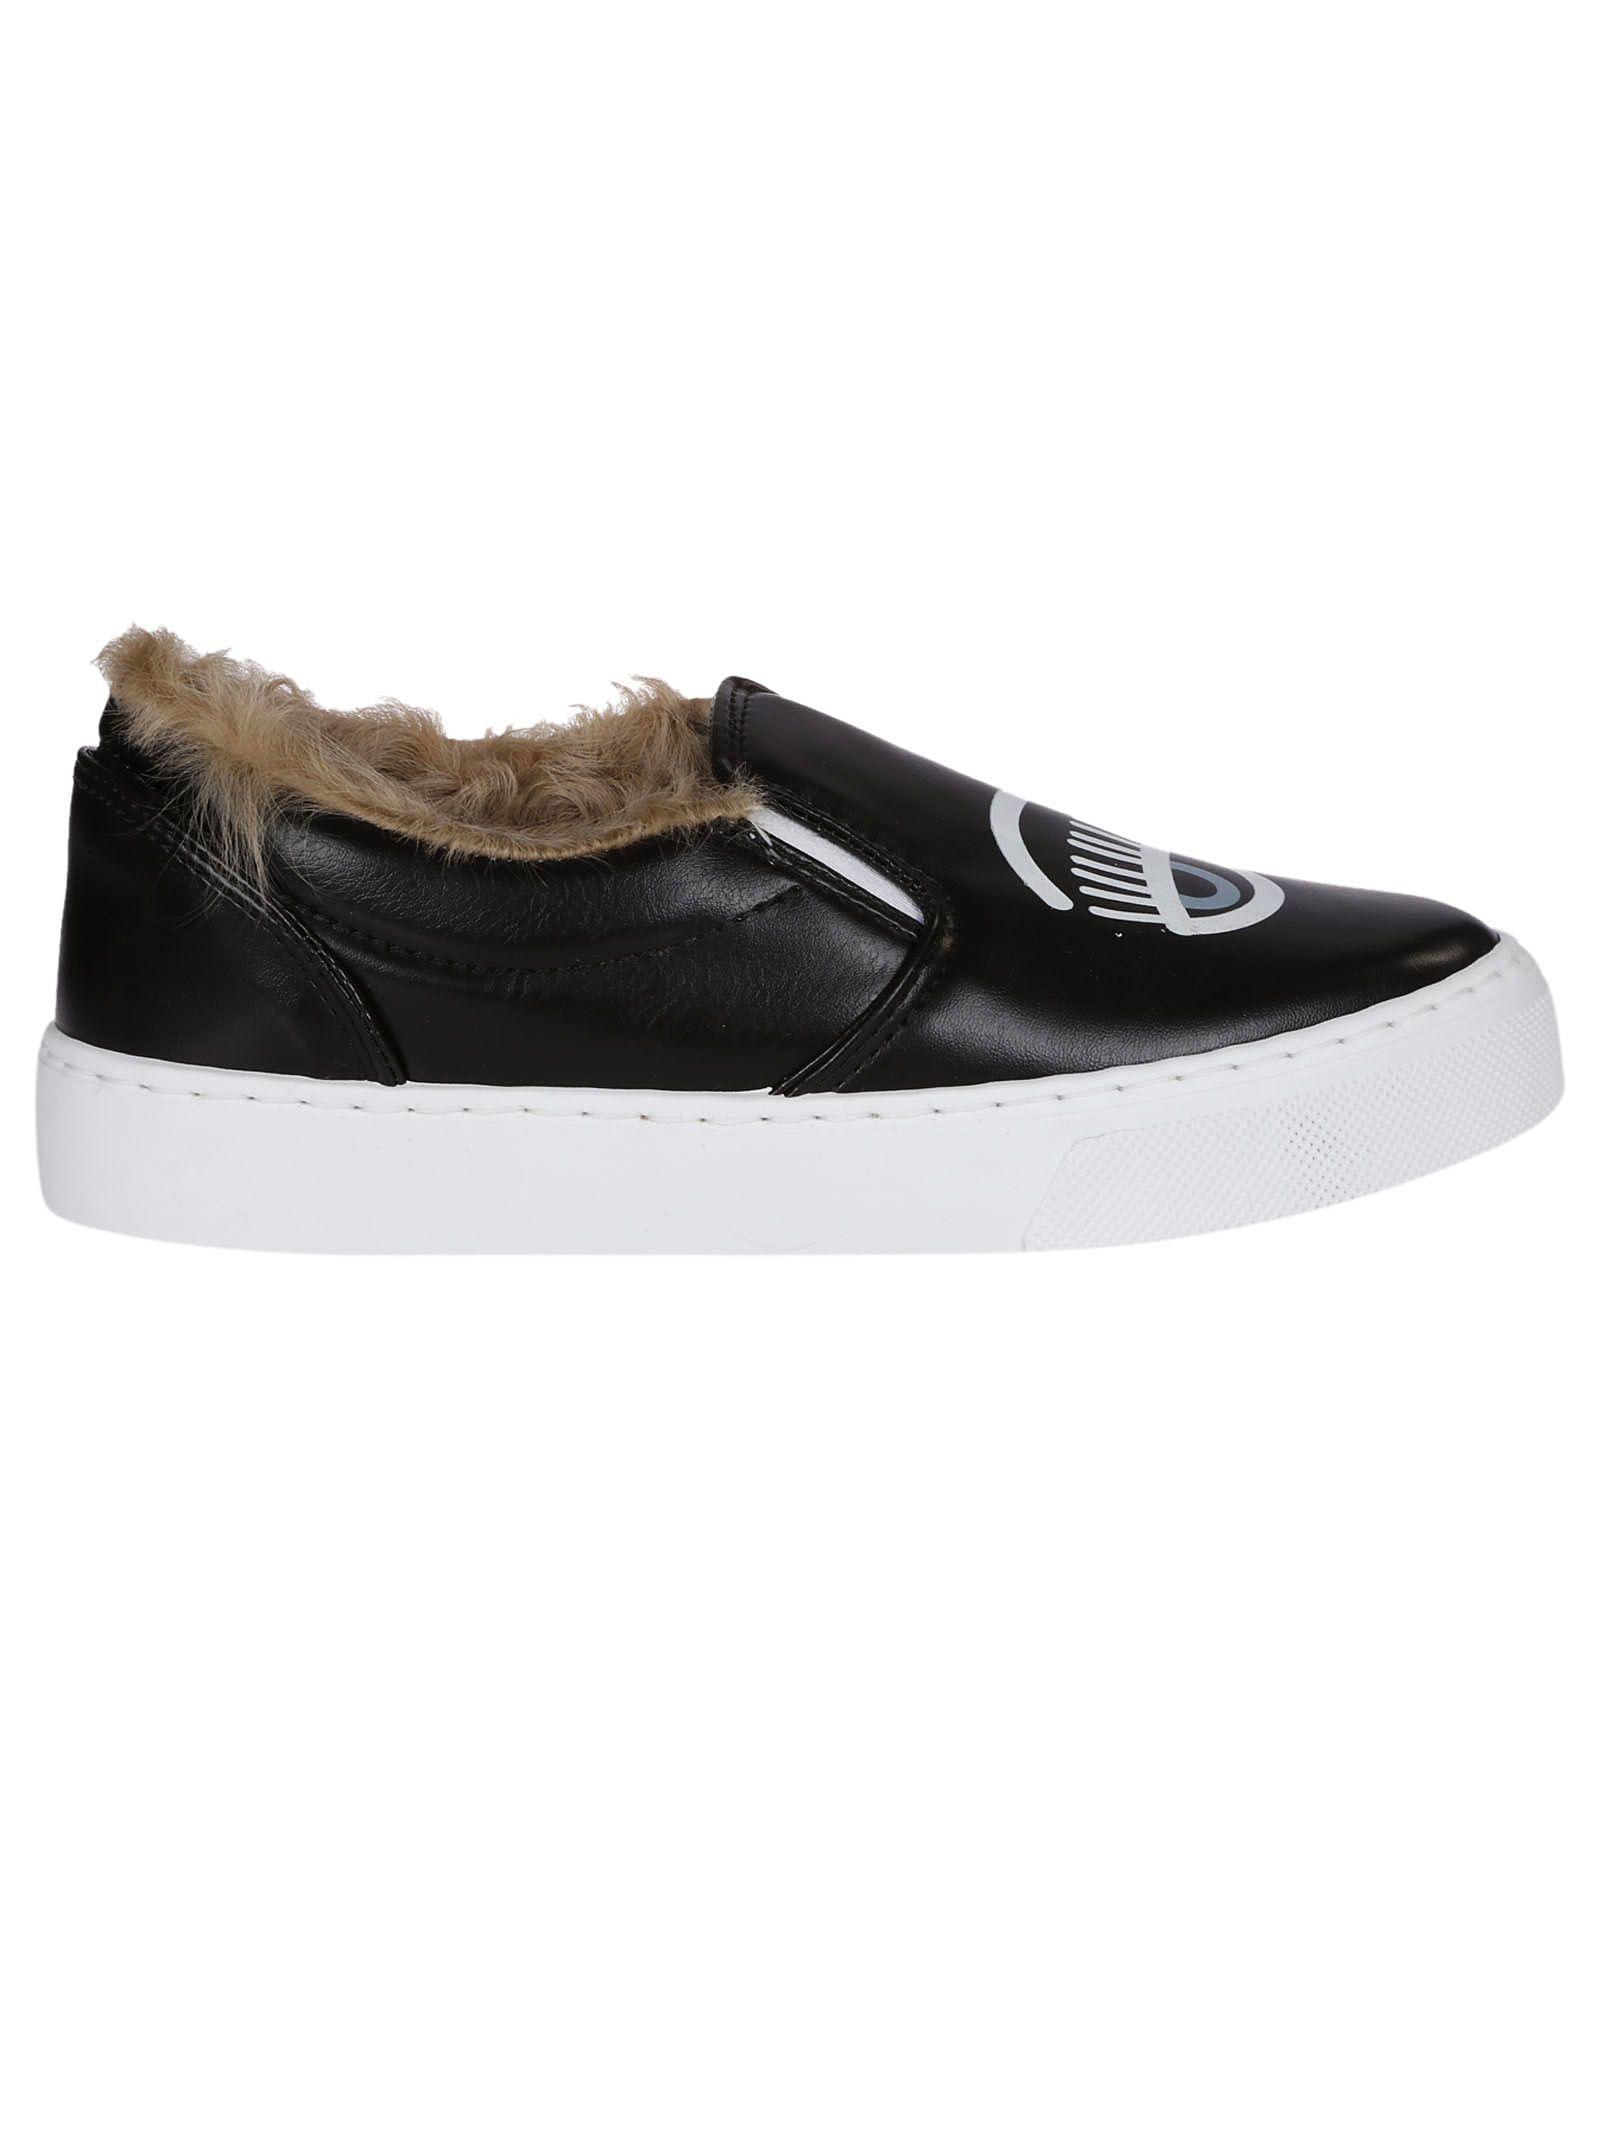 Chiara Ferragni Foderata Slip-on Sneakers